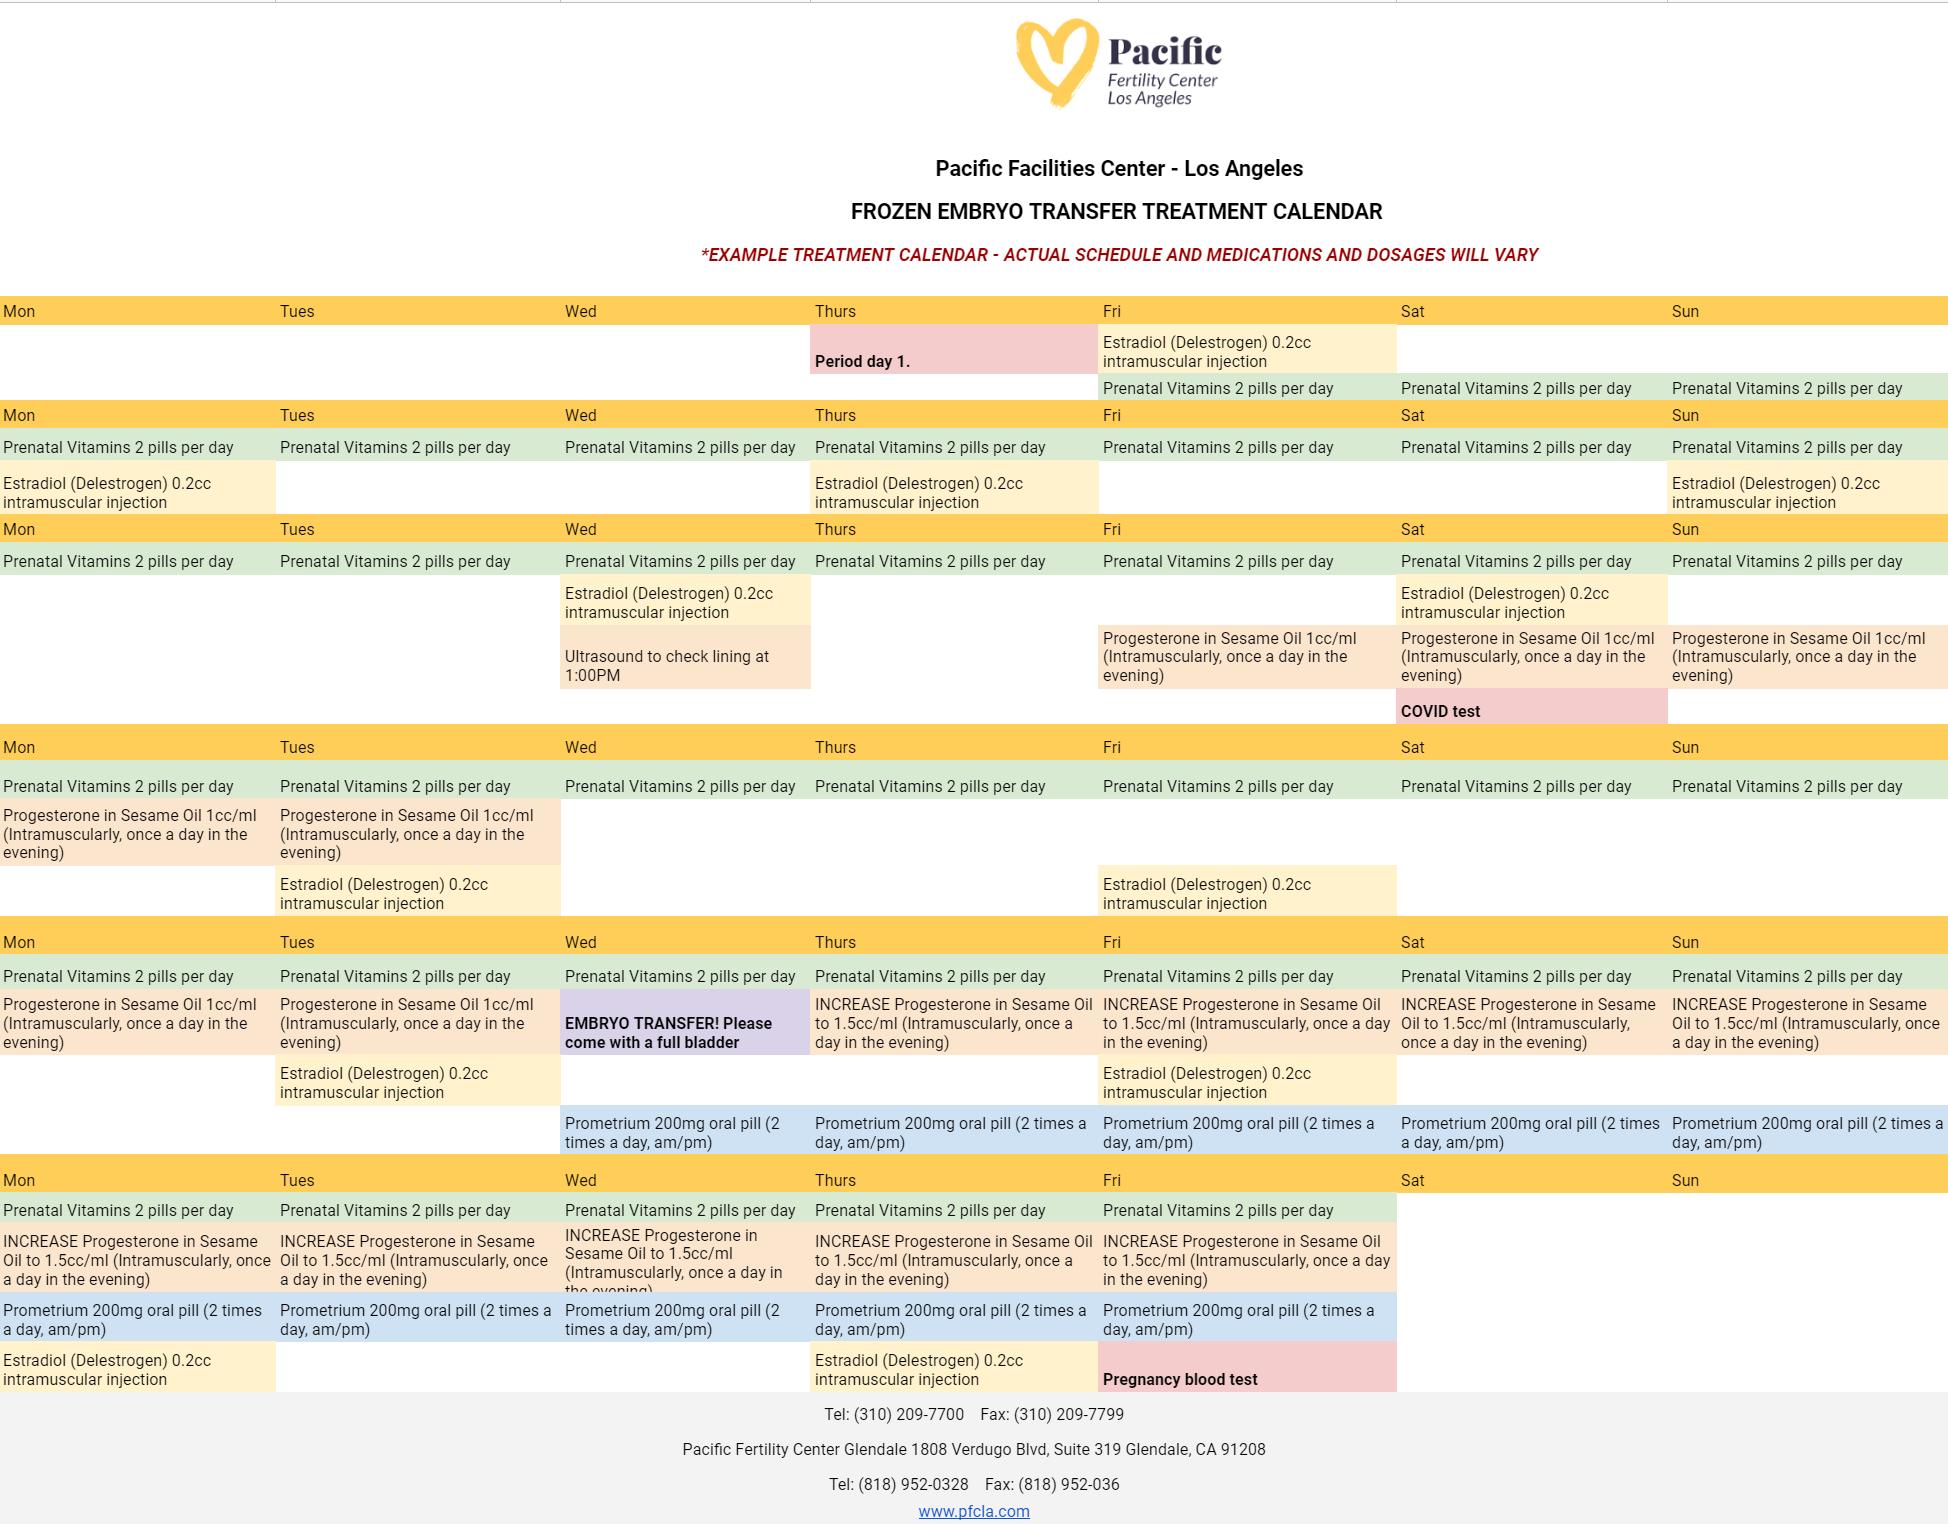 frozen embryo transfer timeline in calendar example